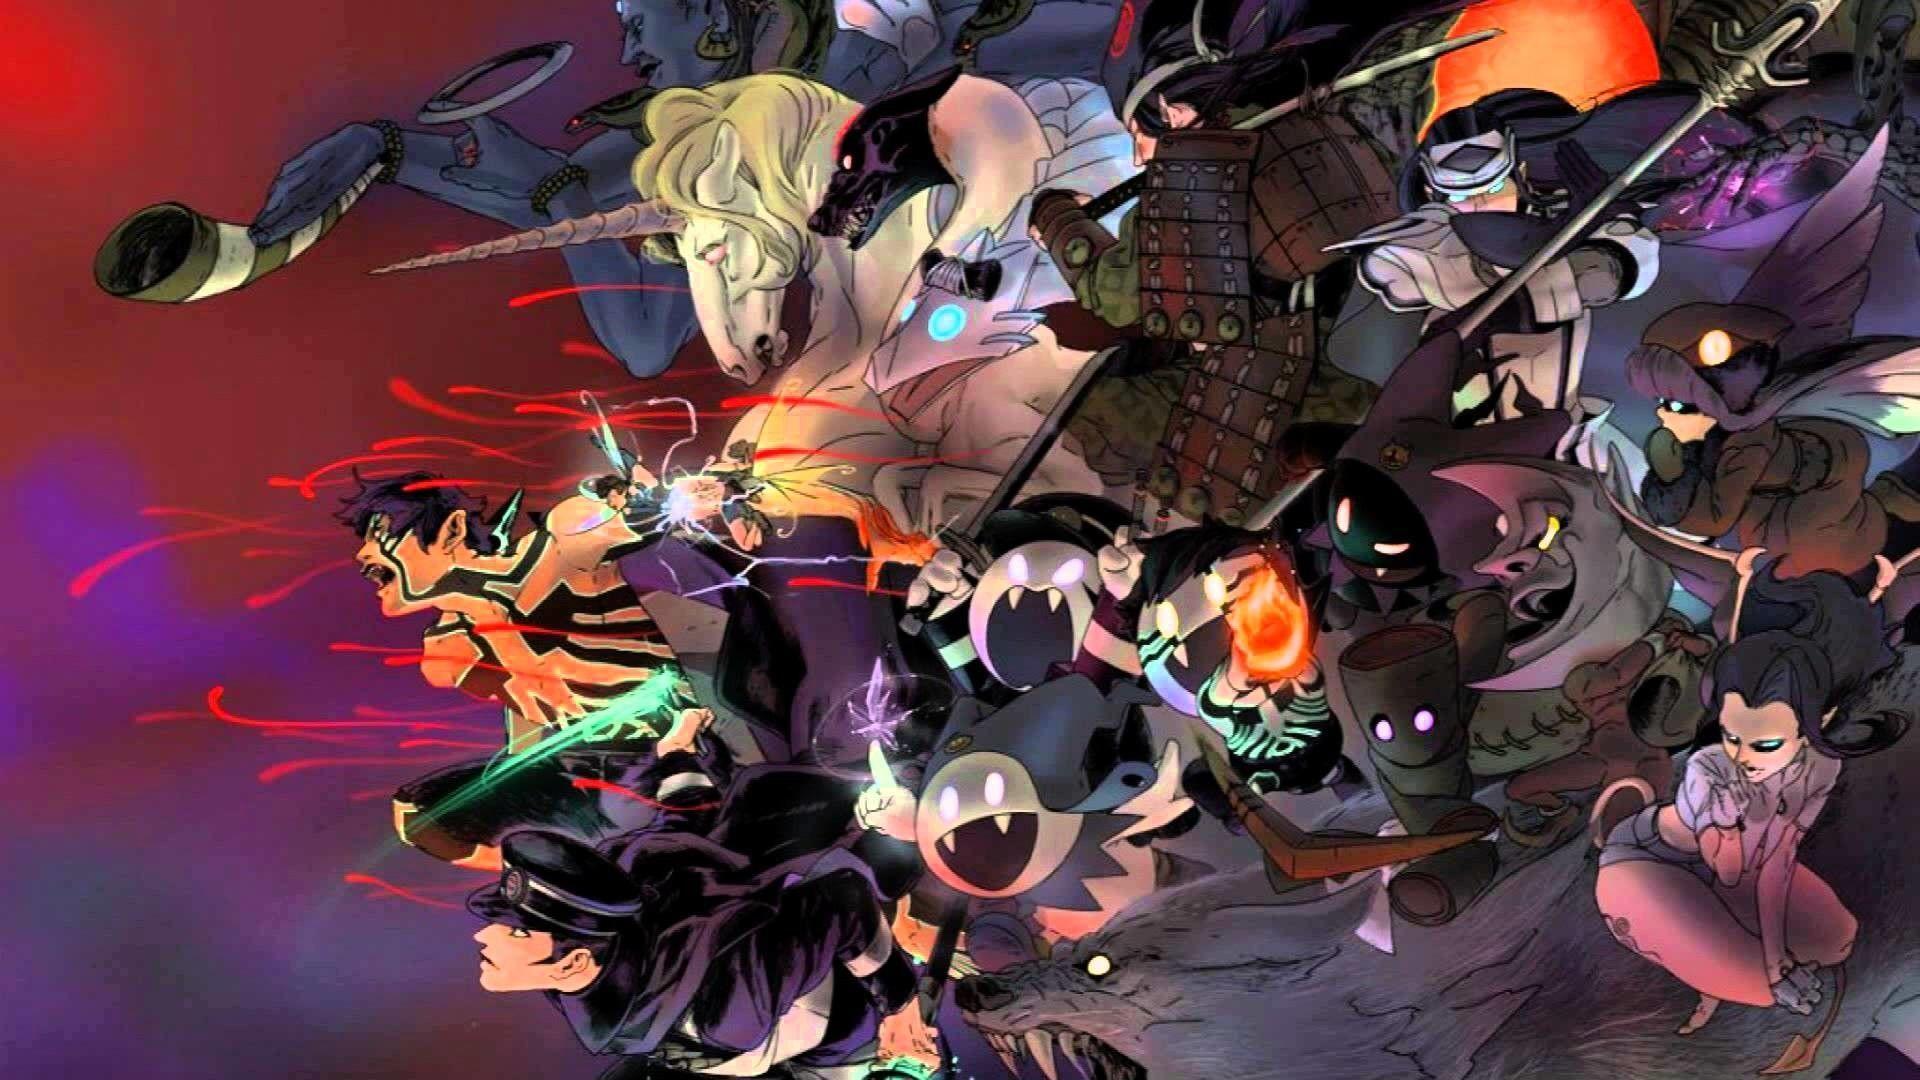 Atlus - Shin Megami Tensei Nocturne